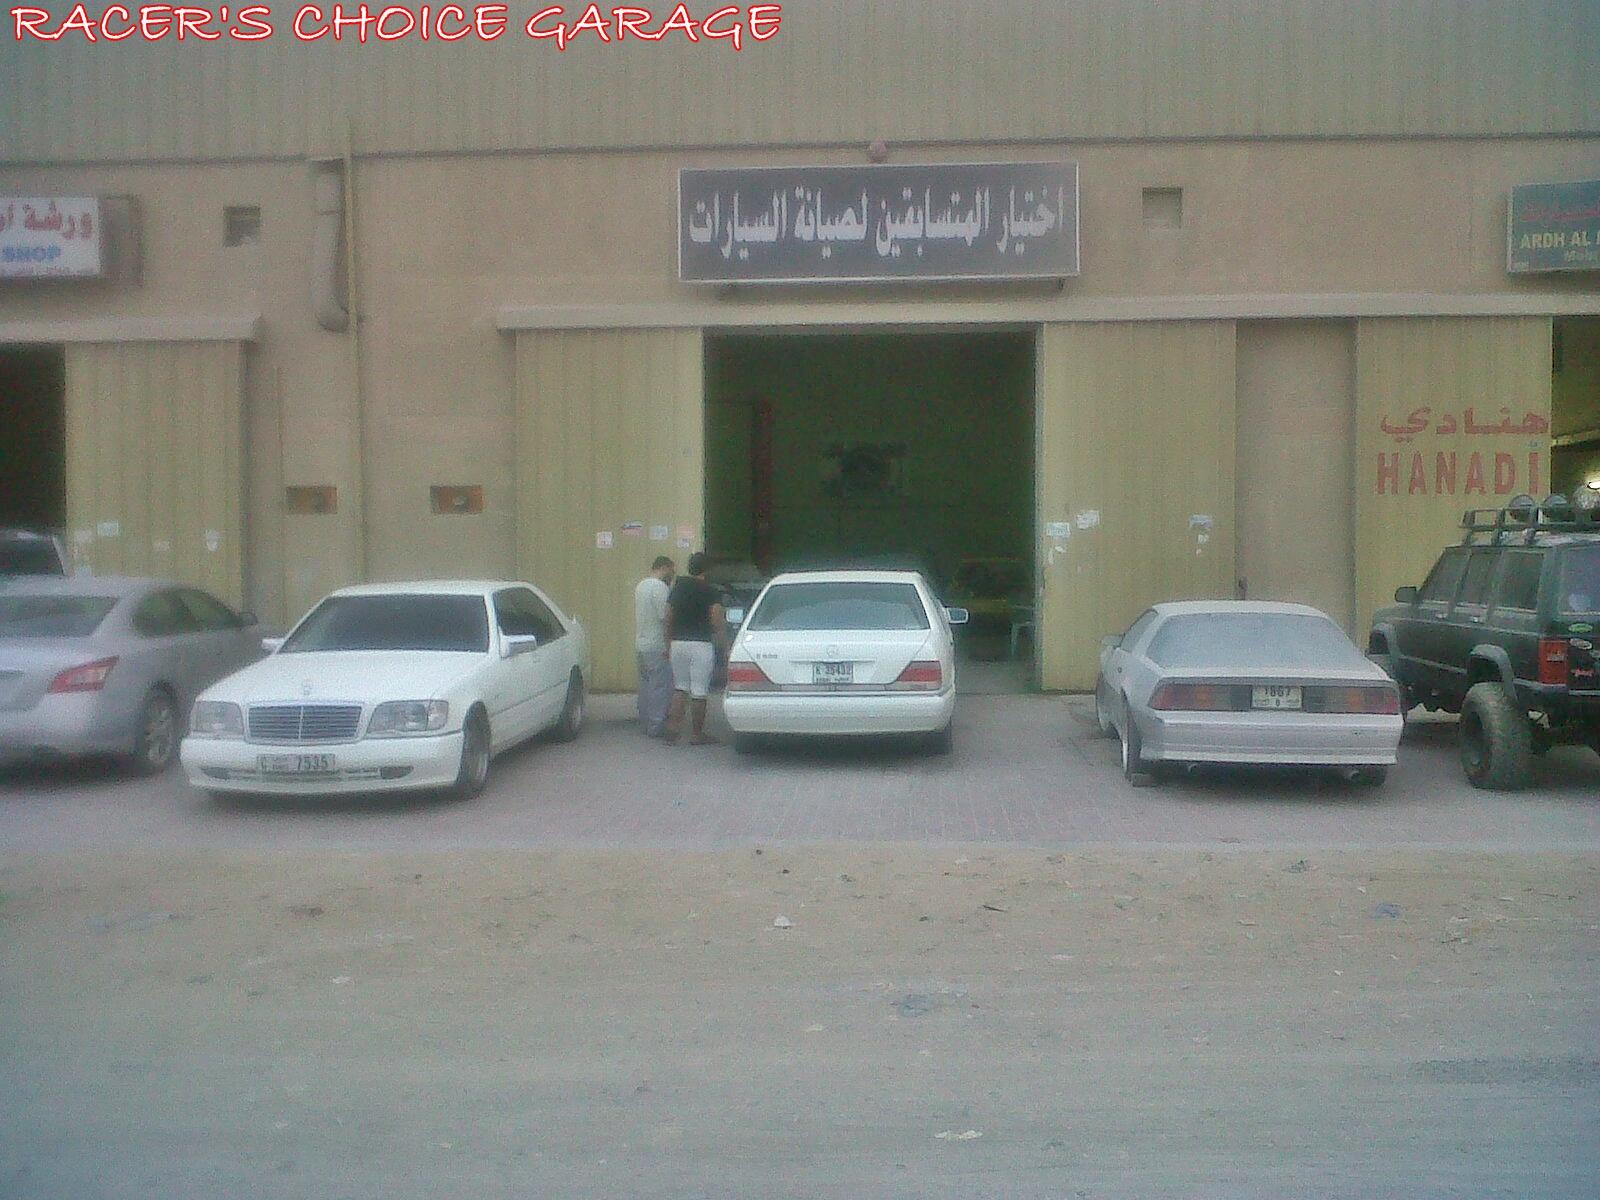 File:Racer's Choice Performance Garage UAE (Al Stroker Group